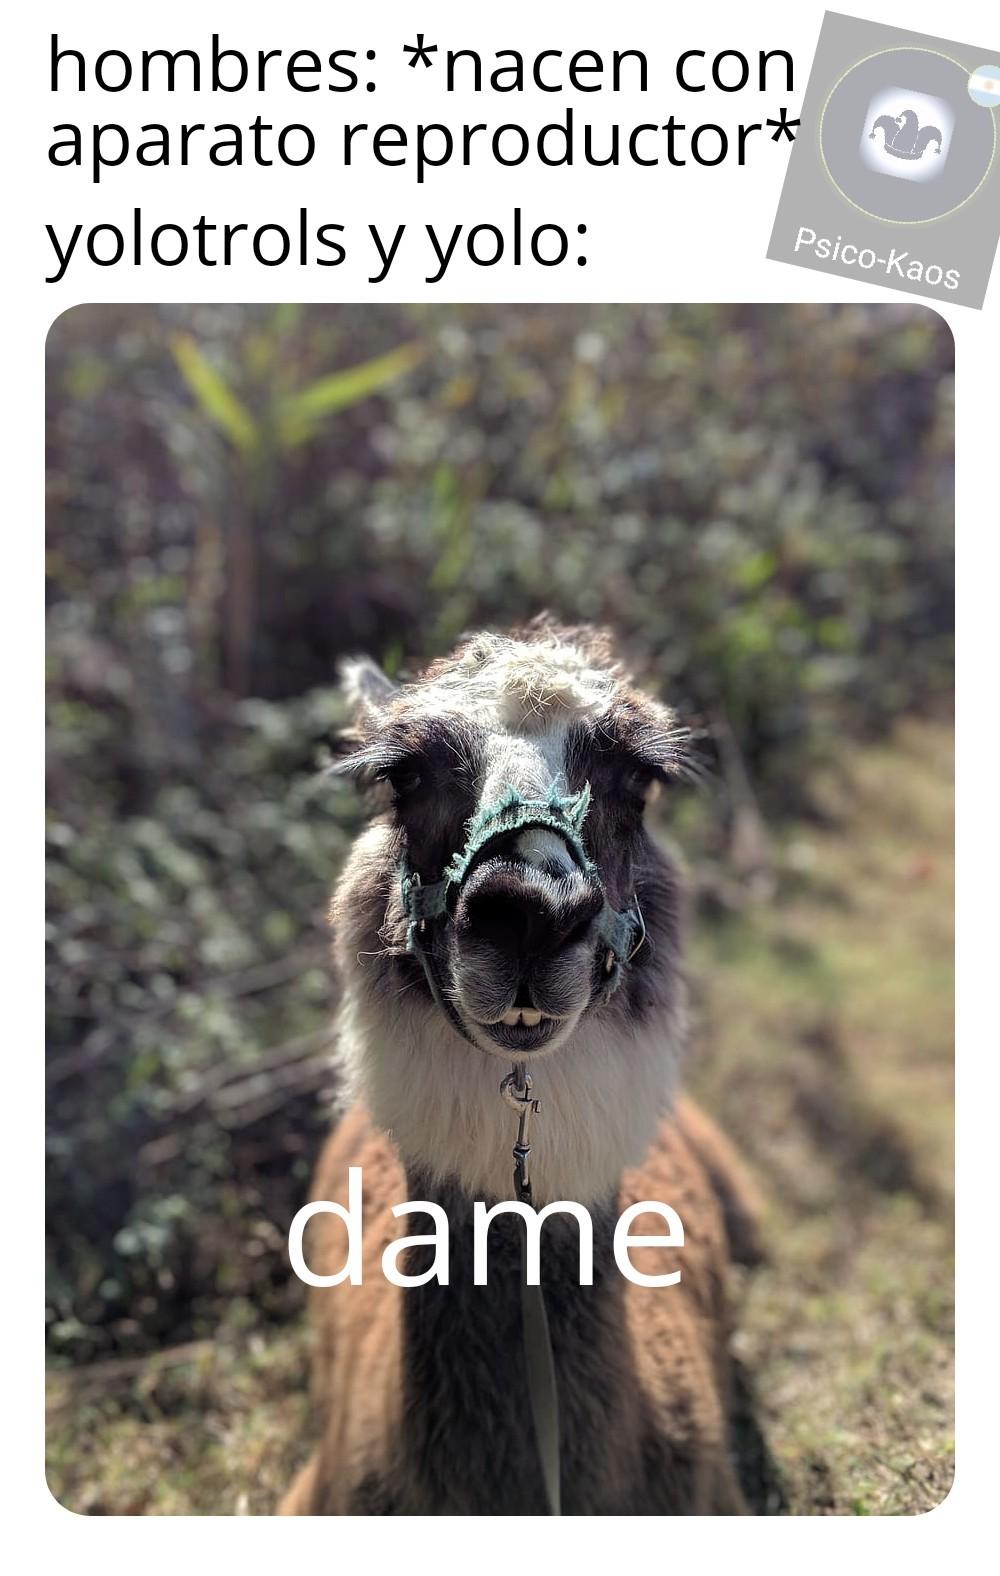 Pene: *existe* el admin: dame - meme